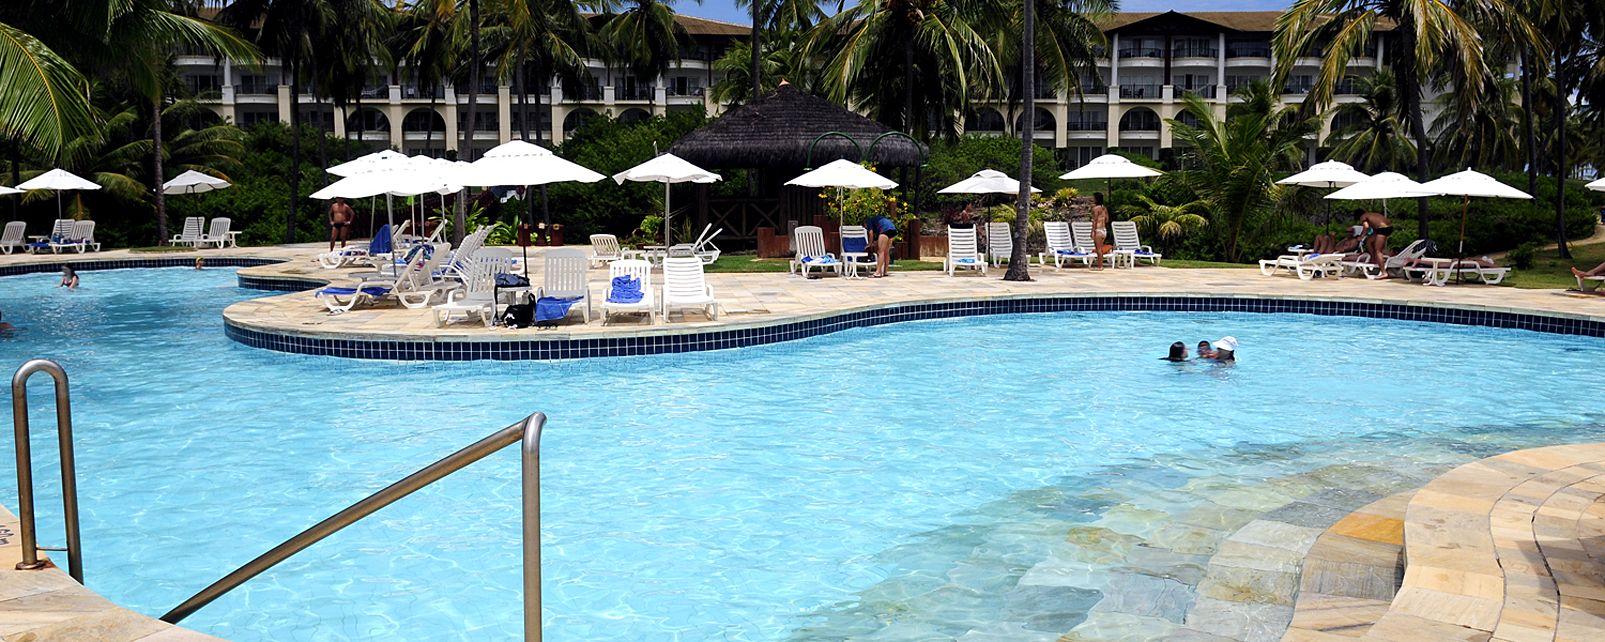 Hotel Costa do Sauipe Park